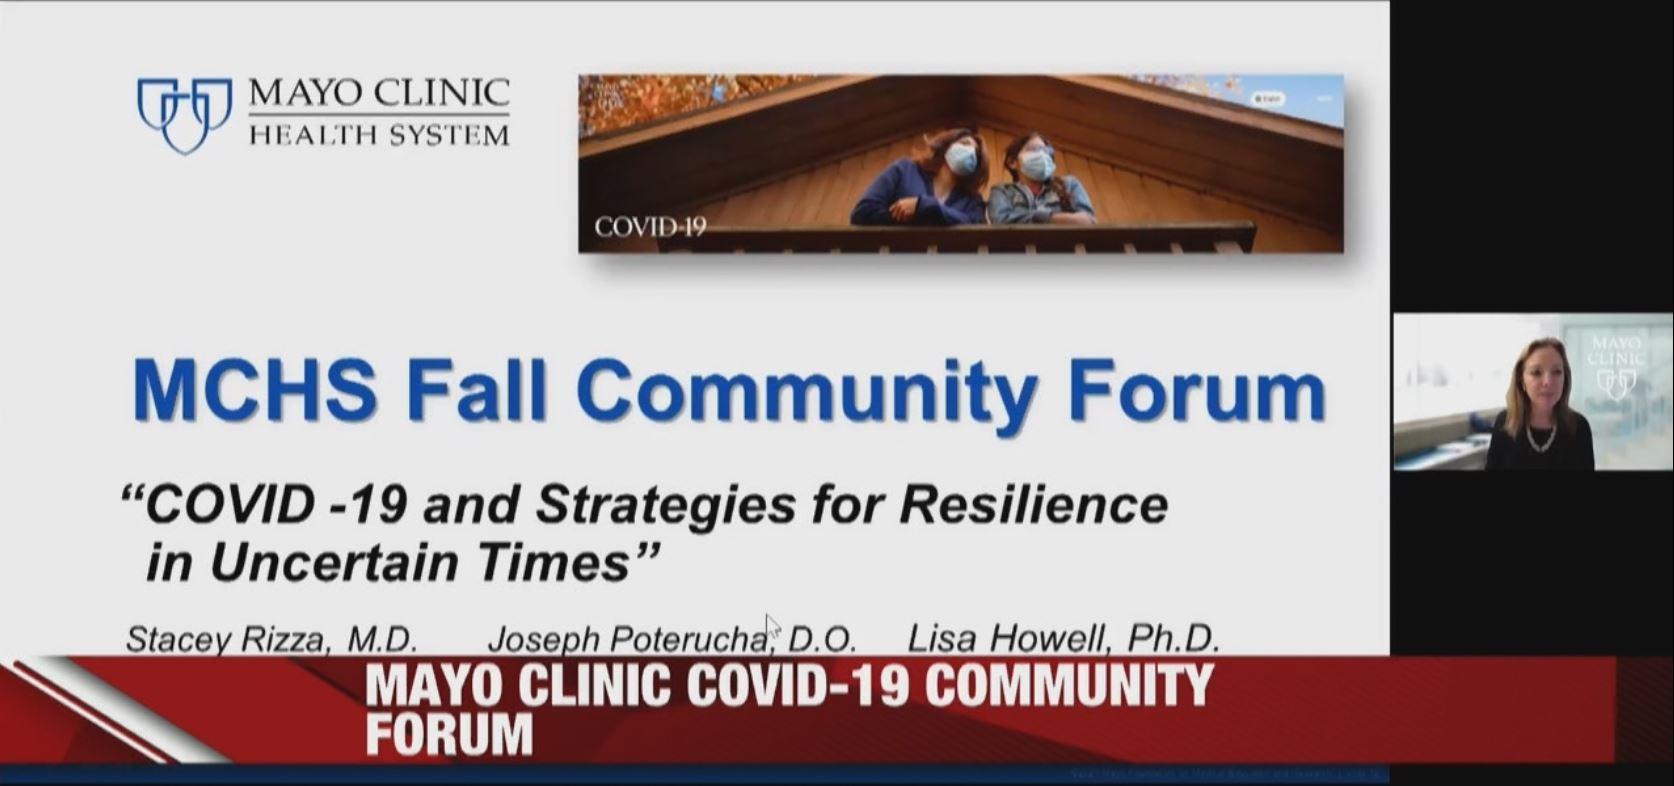 Mayo Clinic COVID-19 community forum